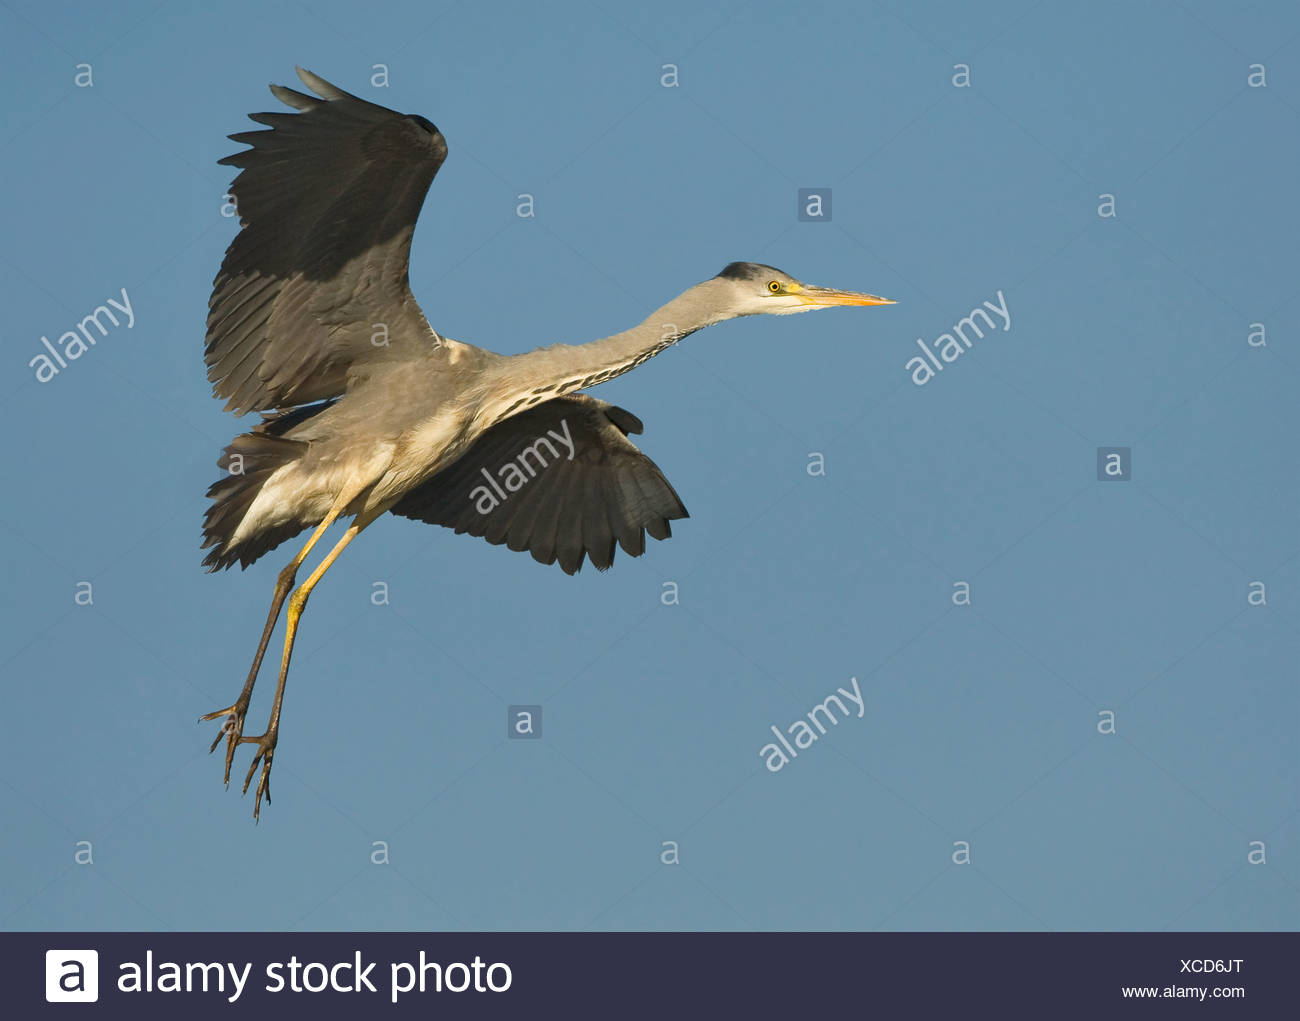 Close up of Grey Heron in flight, Marievale Bird Sanctuary, South Africa - Stock Image